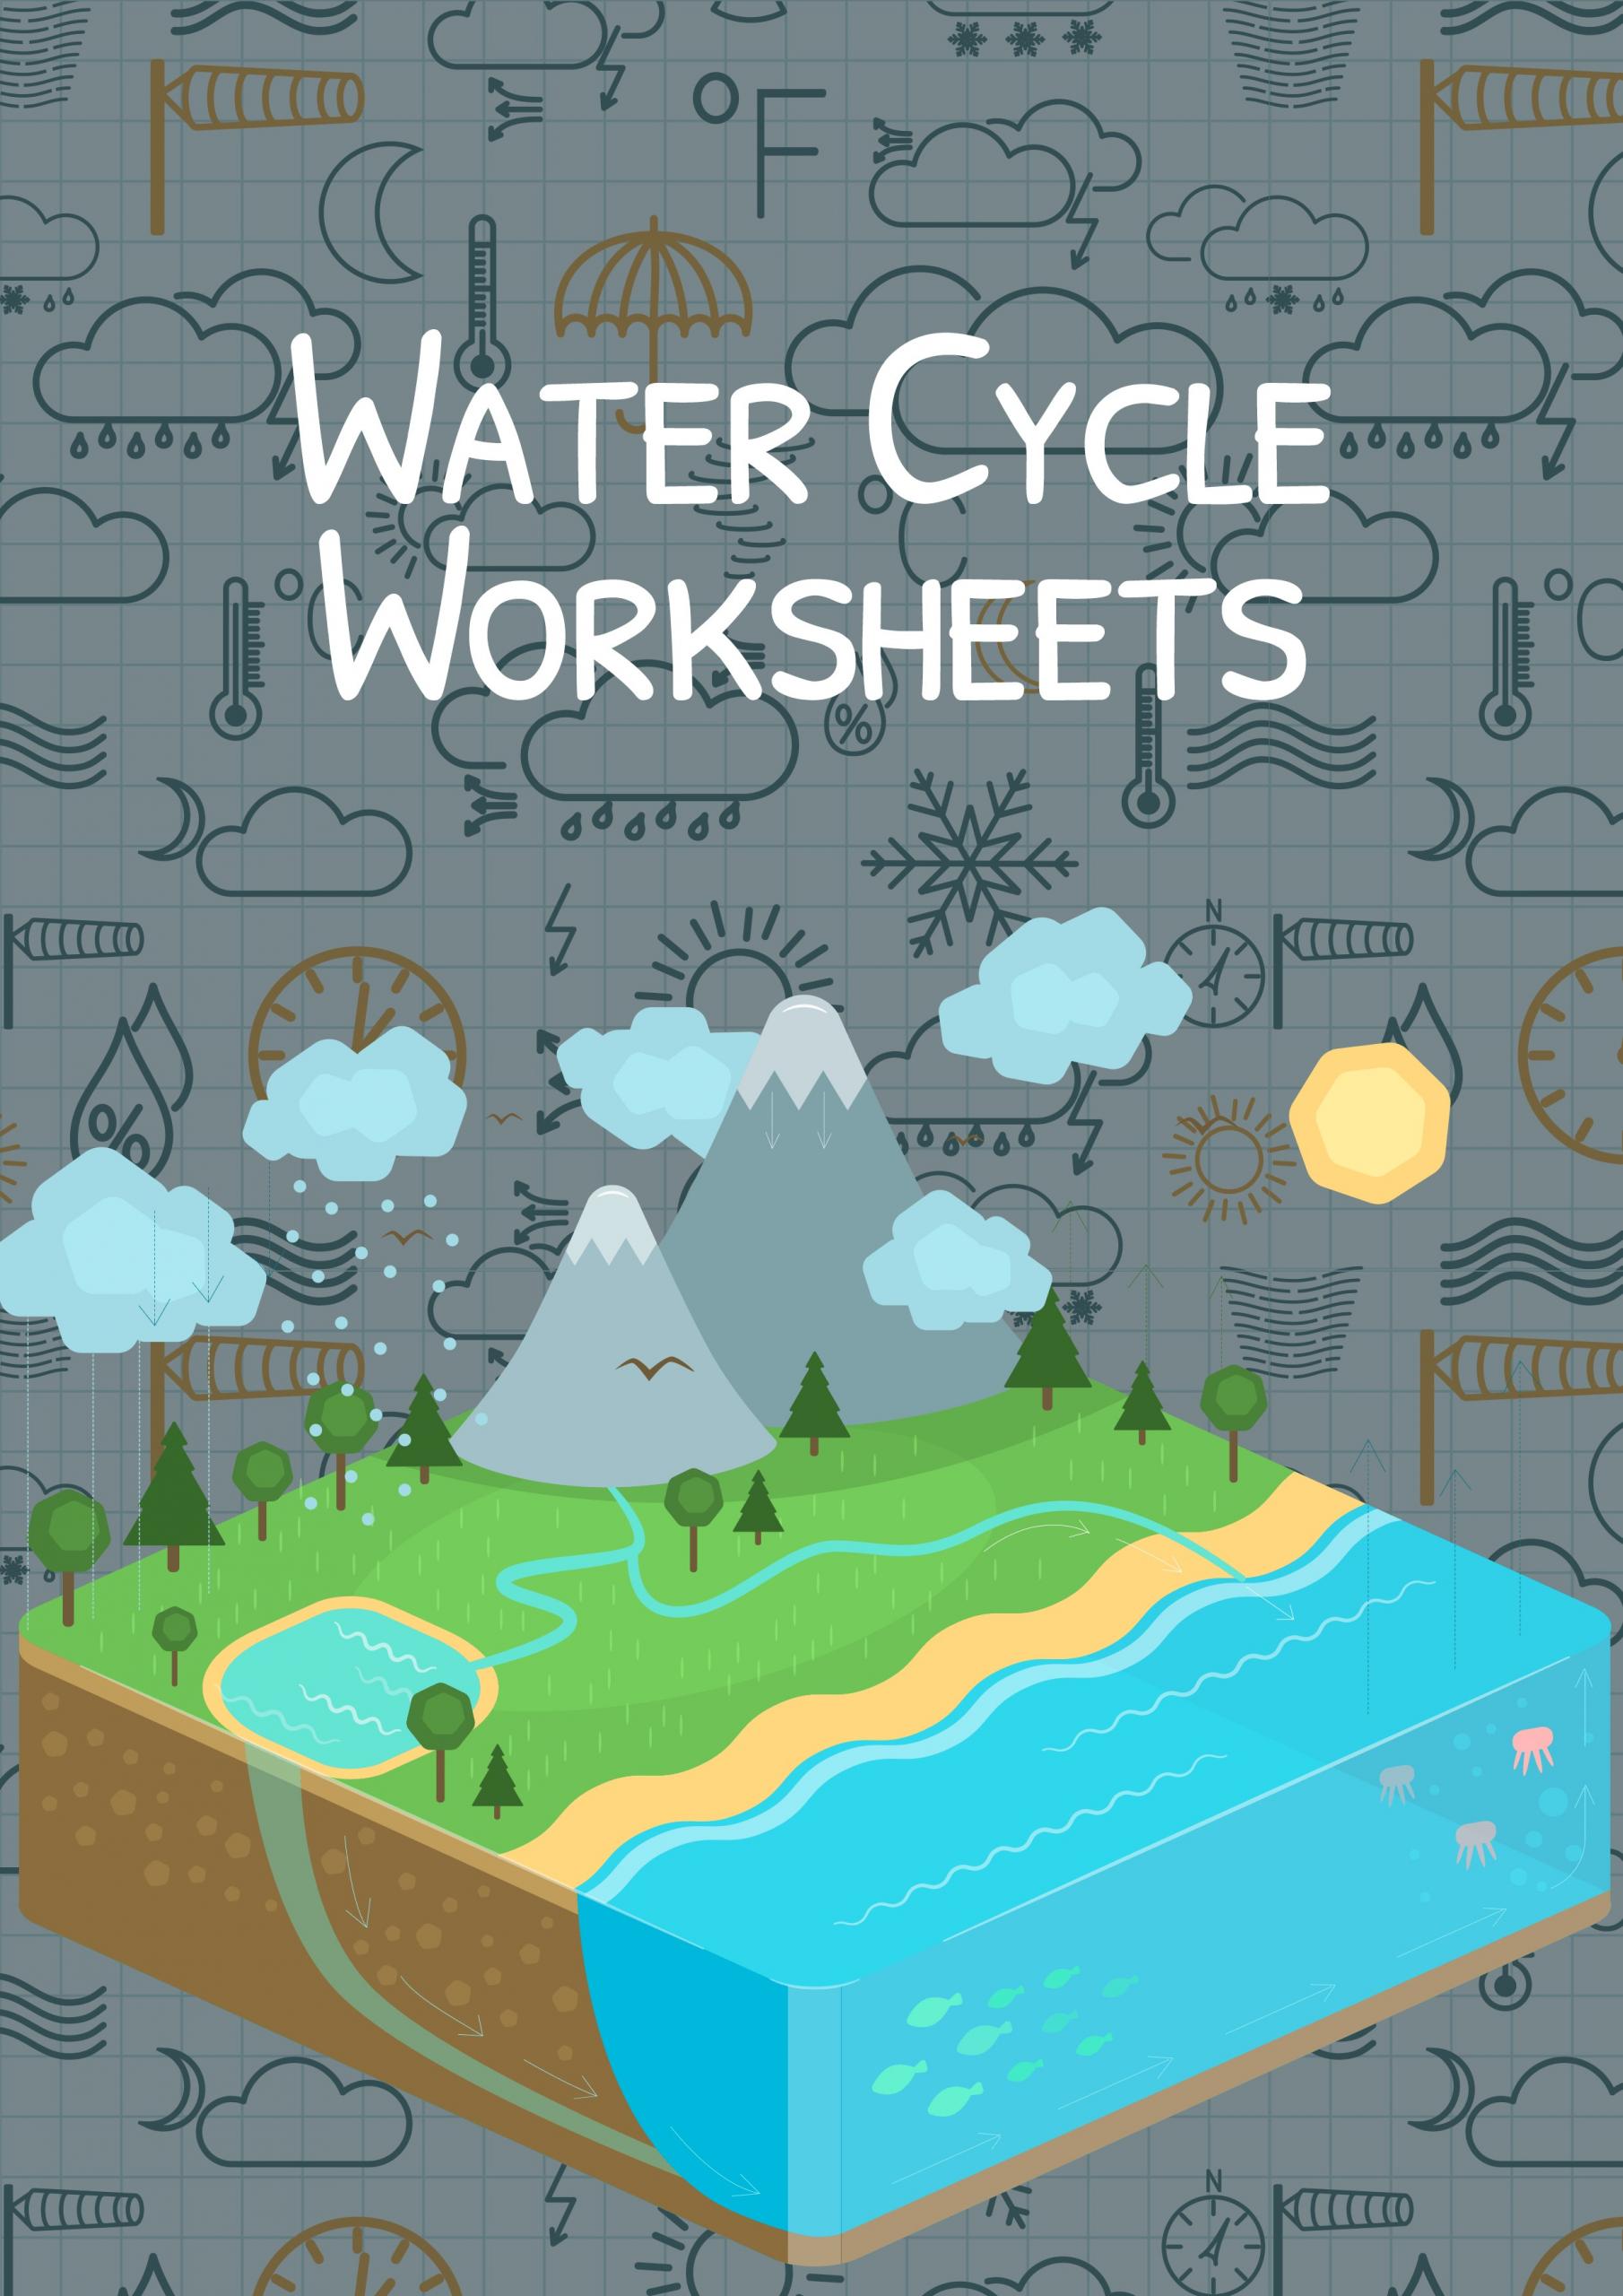 6 Legal Free Subtraction Worksheets For Kindergarten Di